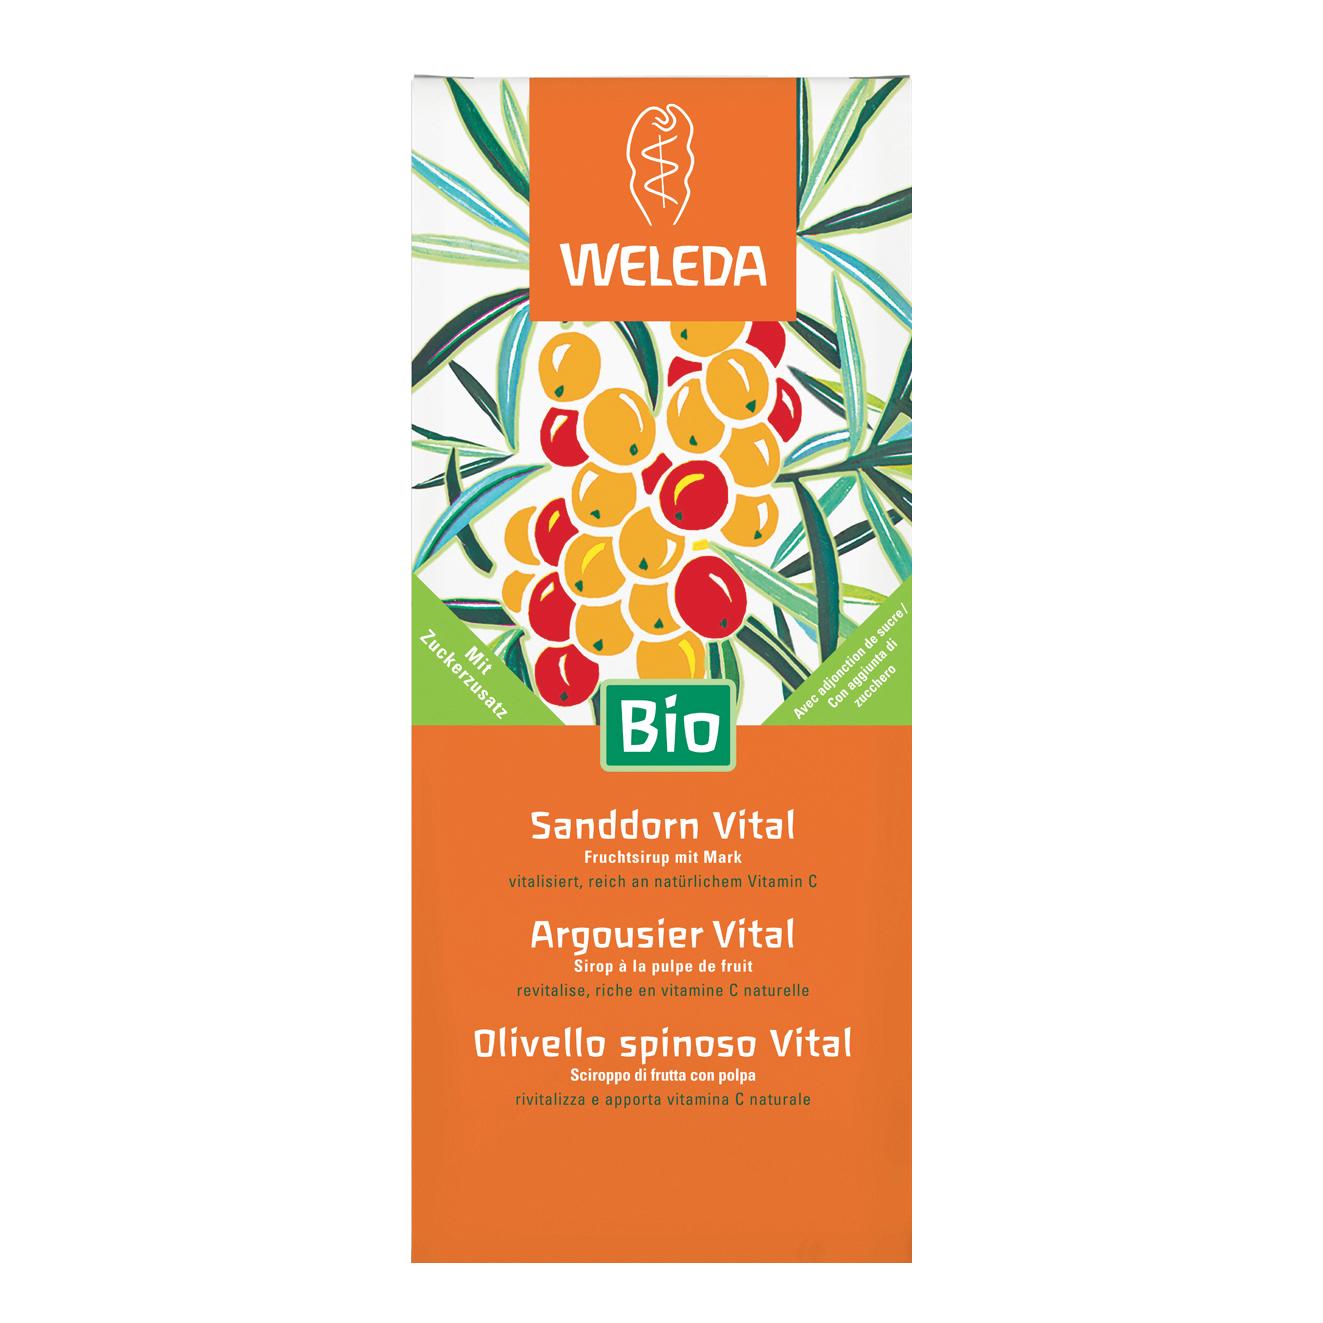 weleda italia srl weleda oliv.spinoso vitalscir.